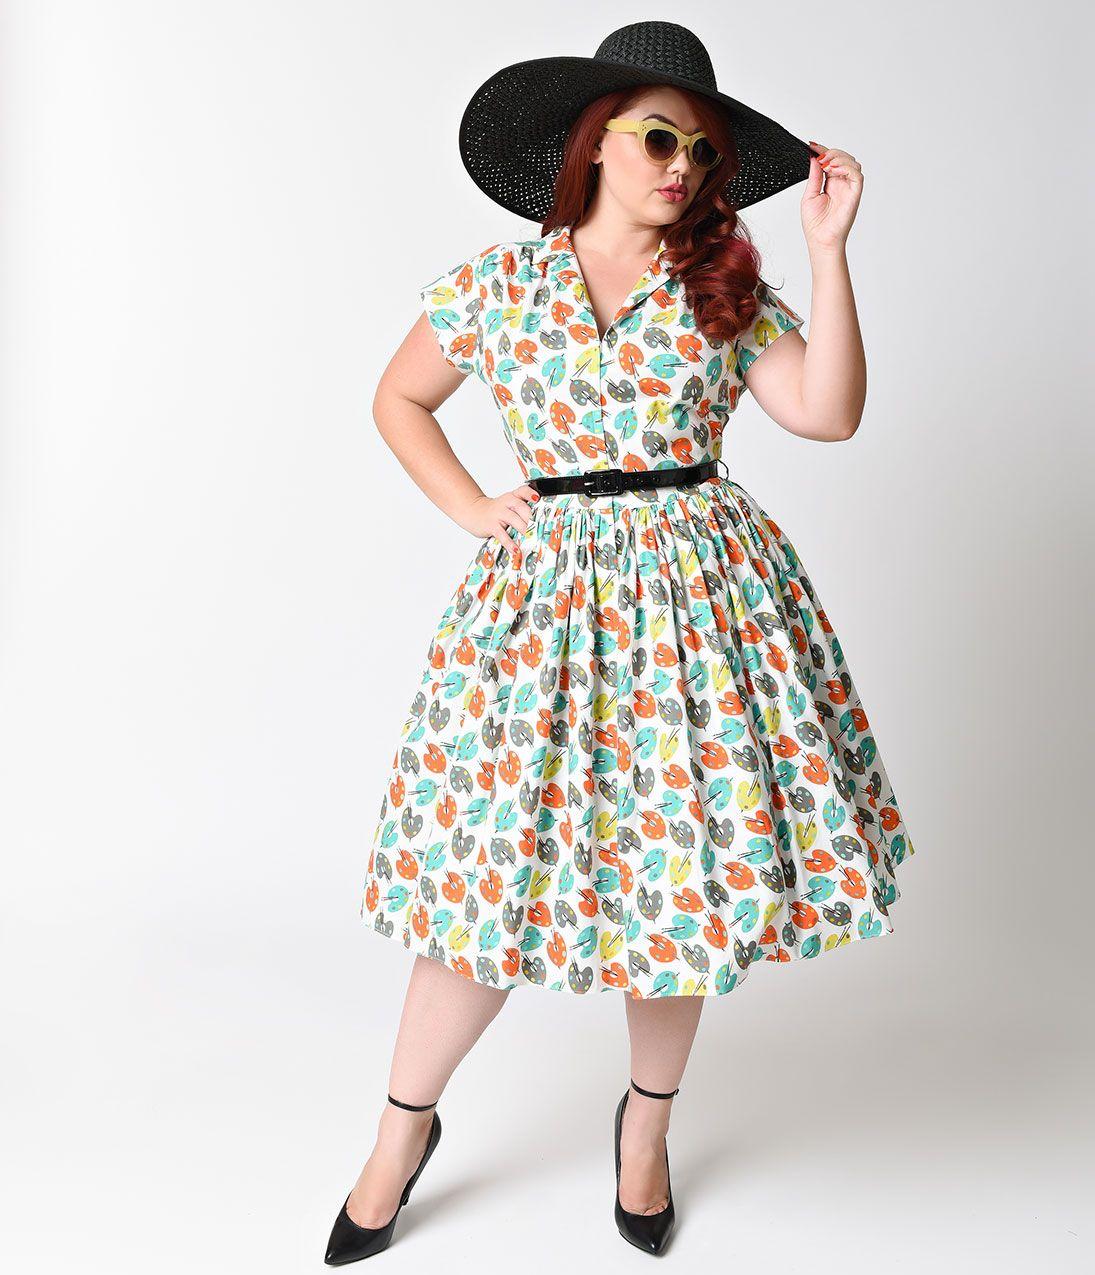 Plus Size Retro Dresses 50s 60s 70s 80s 90s Plus Size Vintage Dresses Plus Size Retro Dresses Plus Size Wedding Dresses With Sleeves